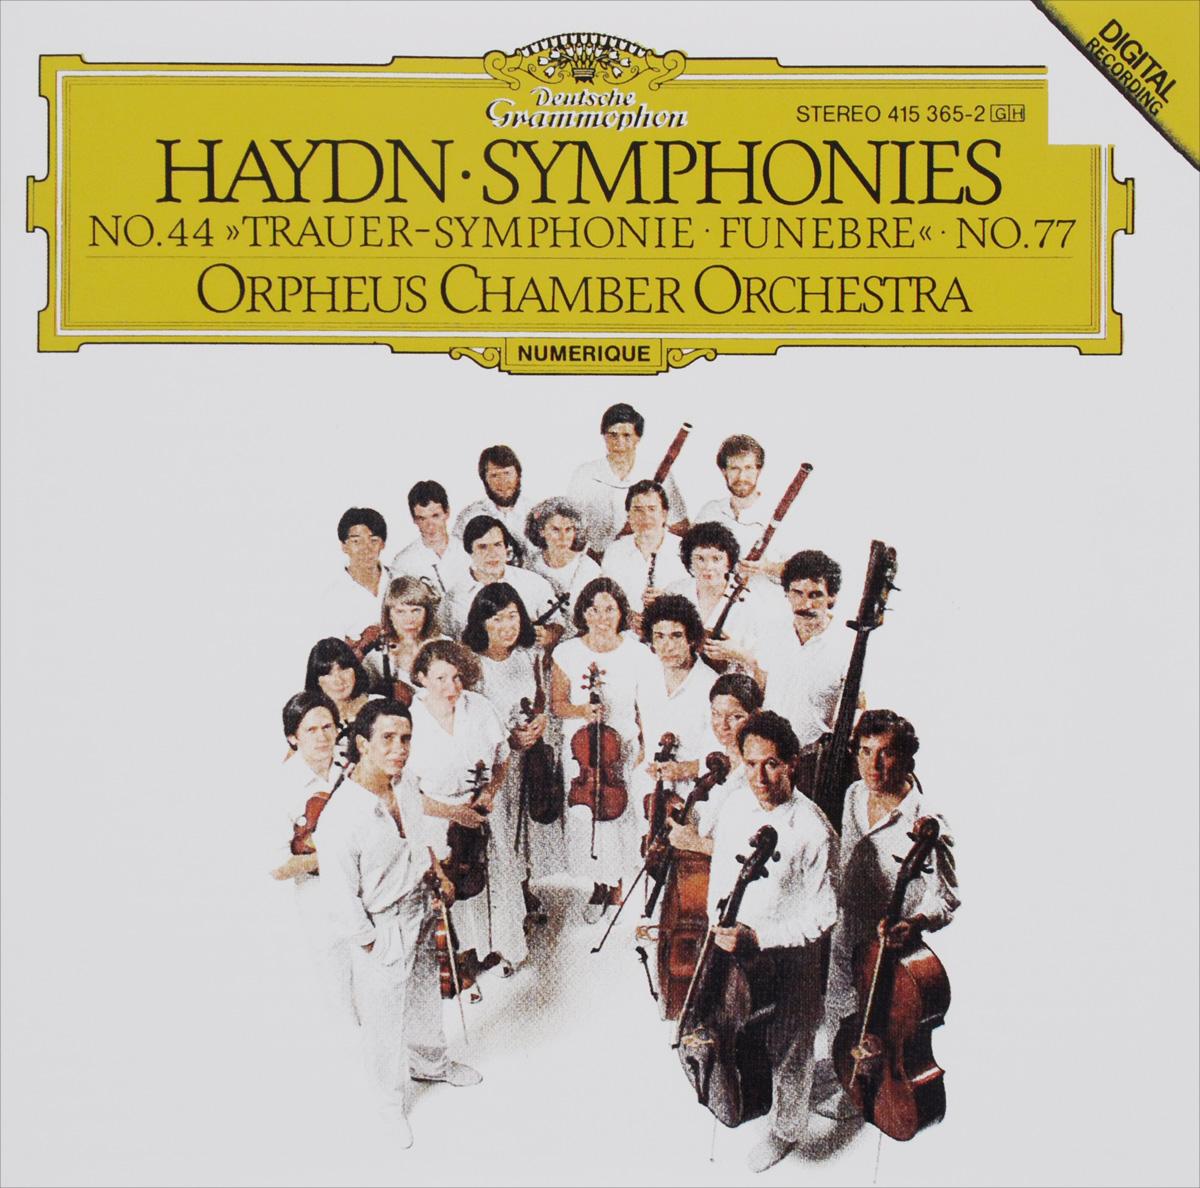 Orpheus Chamber Orchestra. Haydn. Symphonies No. 44 Trauer-Symphonie & 77 münchner philharmoniker elbphilharmonie hamburg